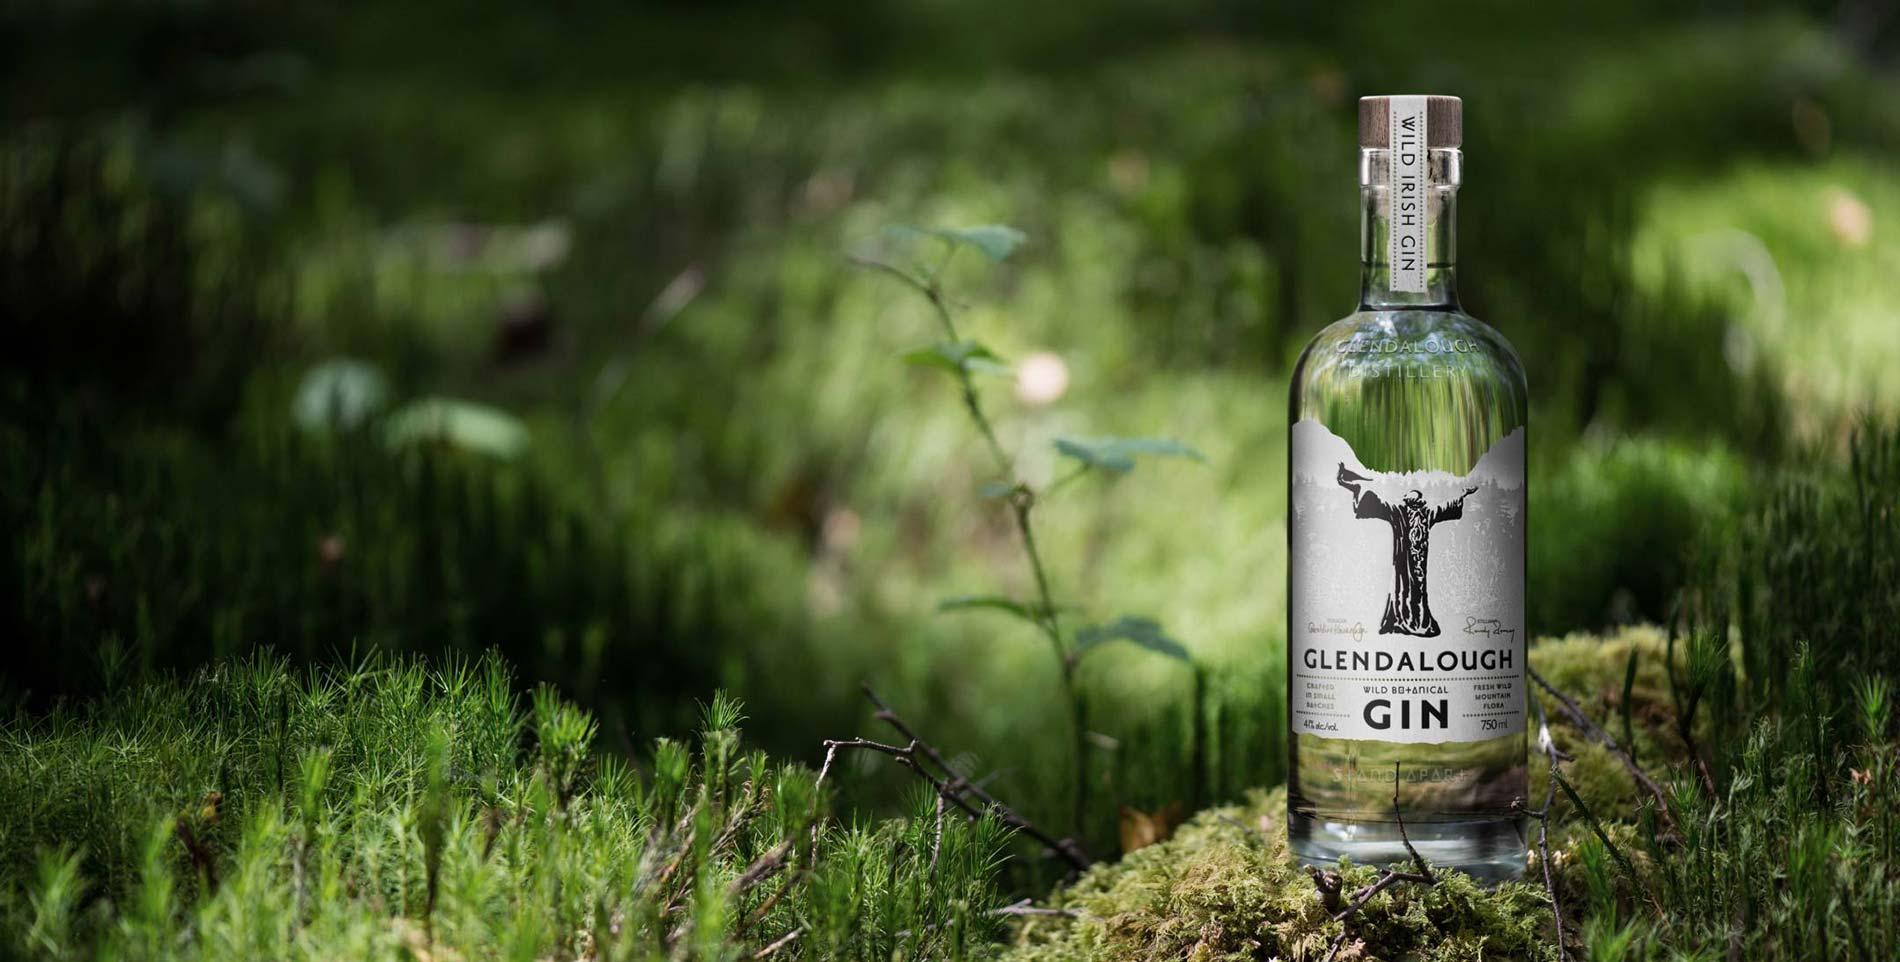 Glendalough21